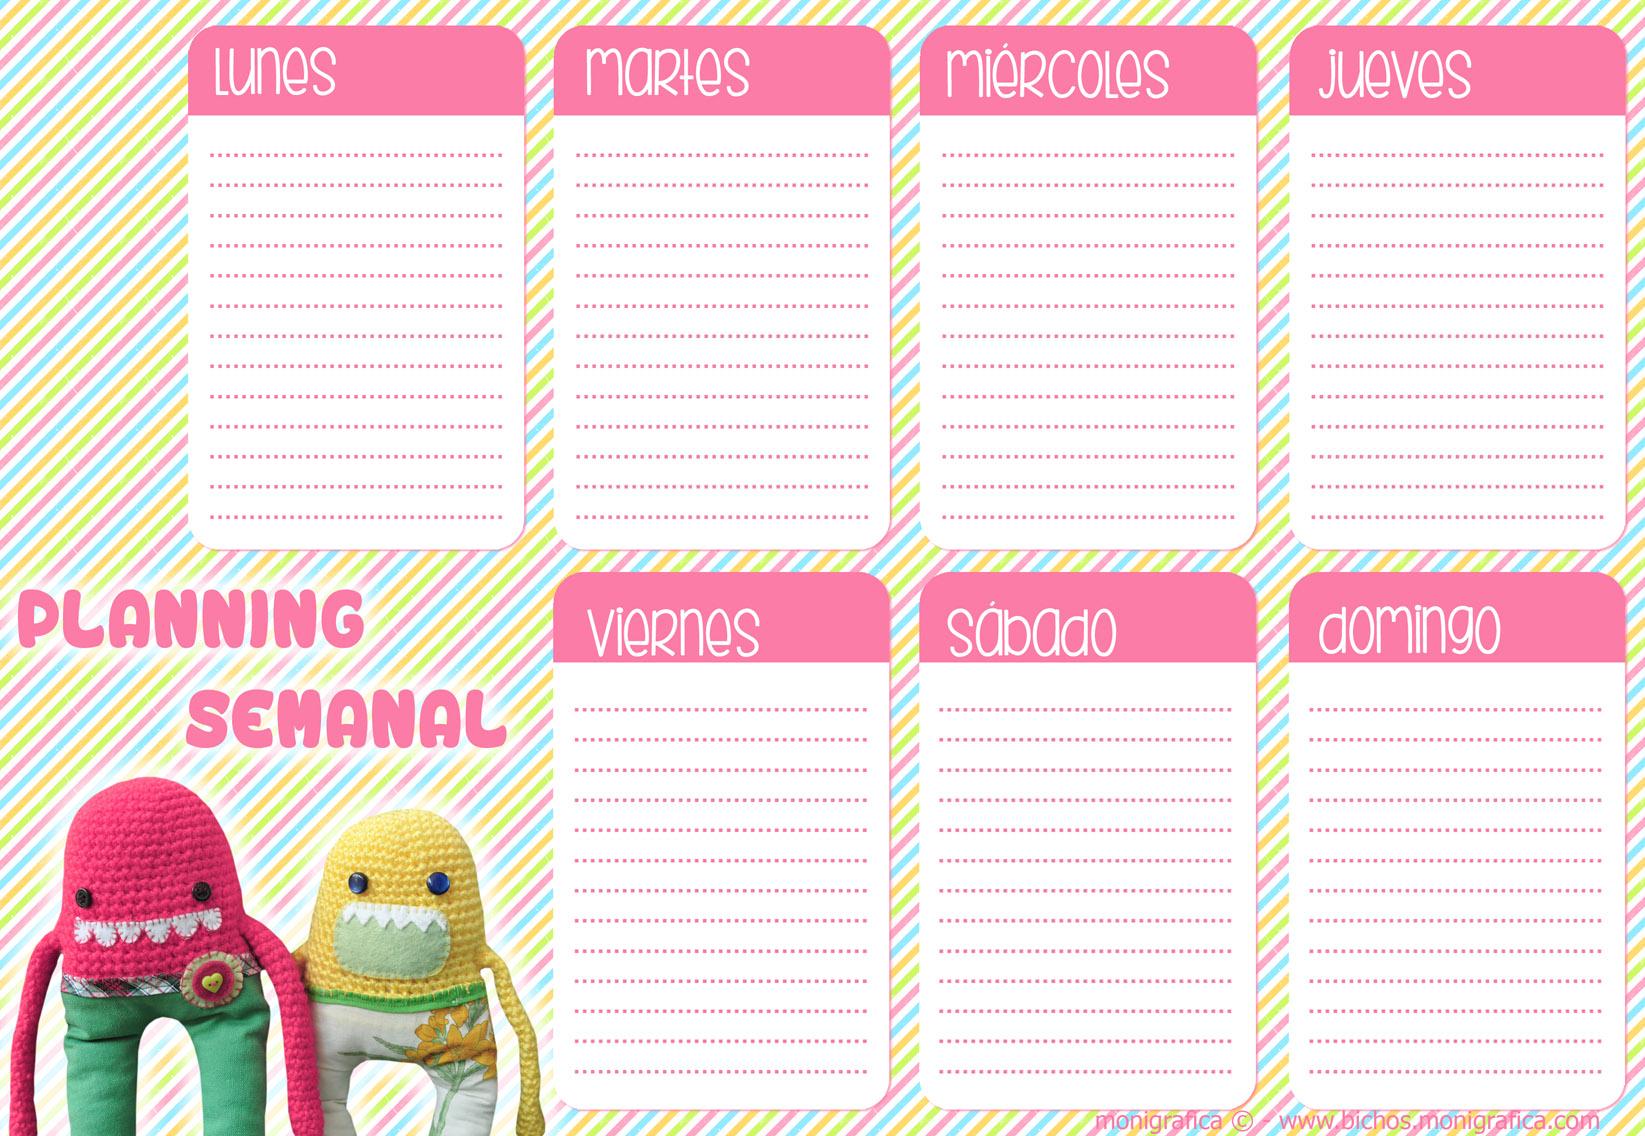 planning_semanal4w